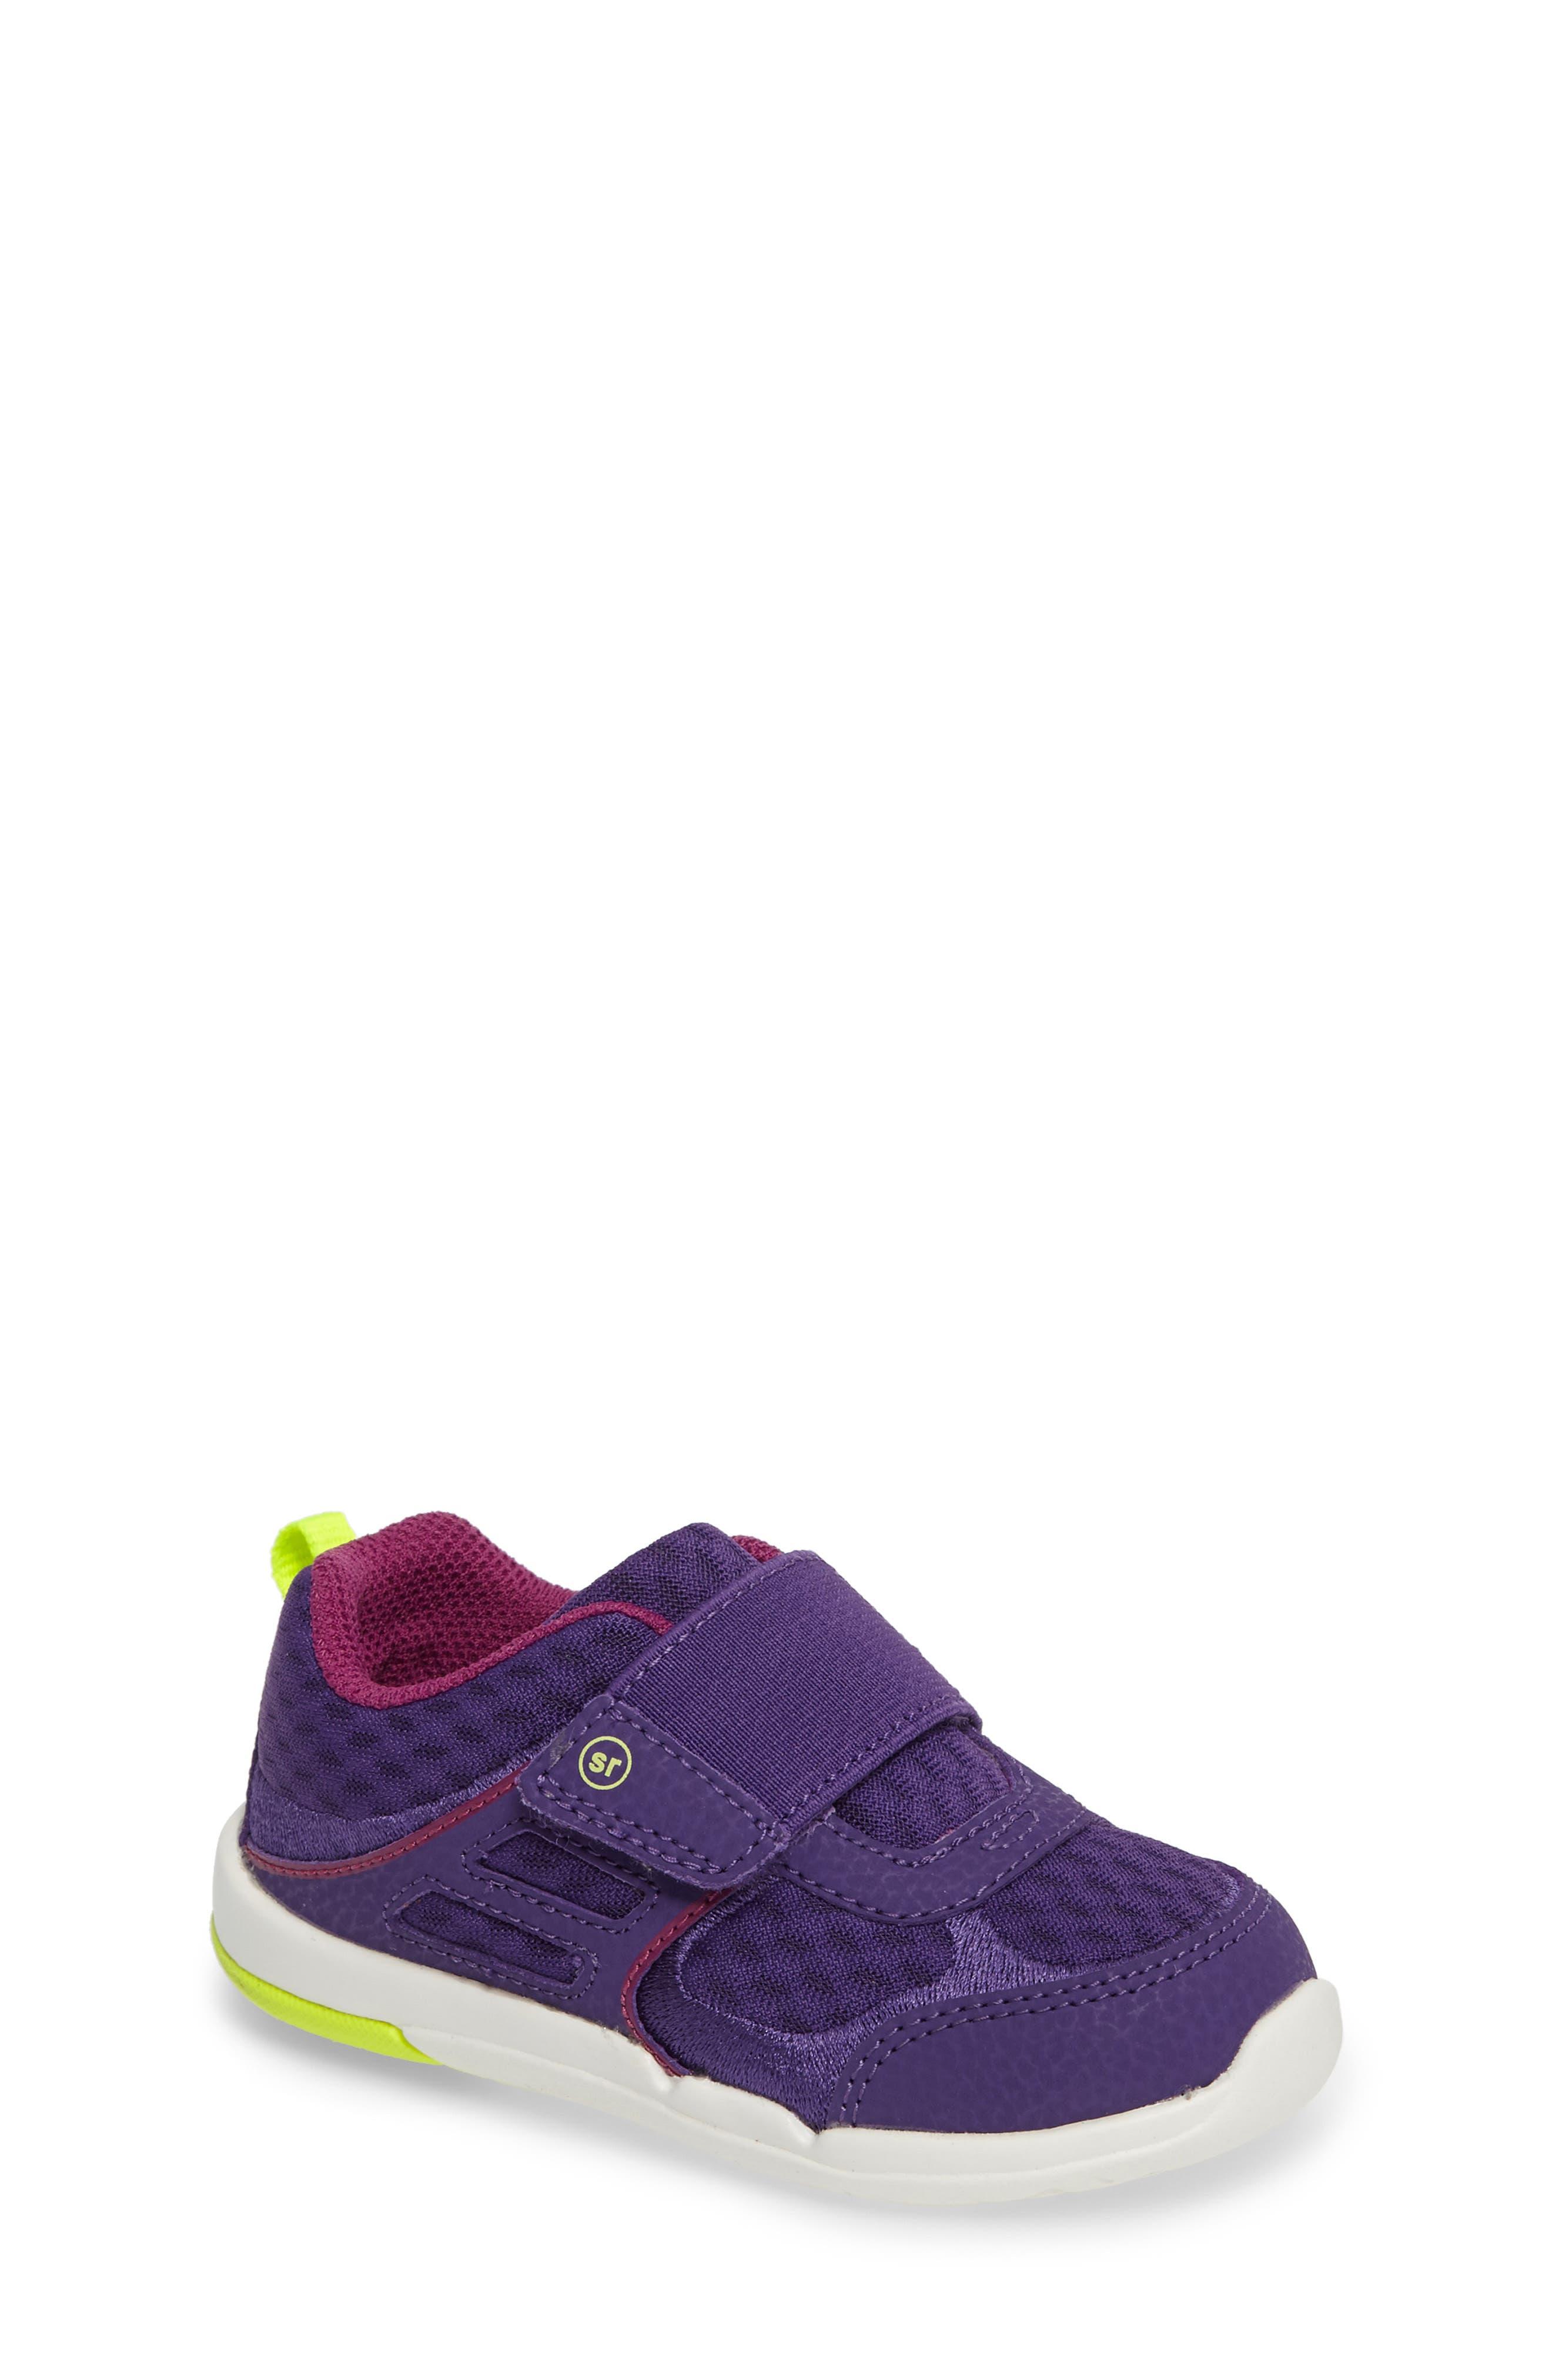 Stride Rite Casey Sneaker (Baby, Toddler & Walker)